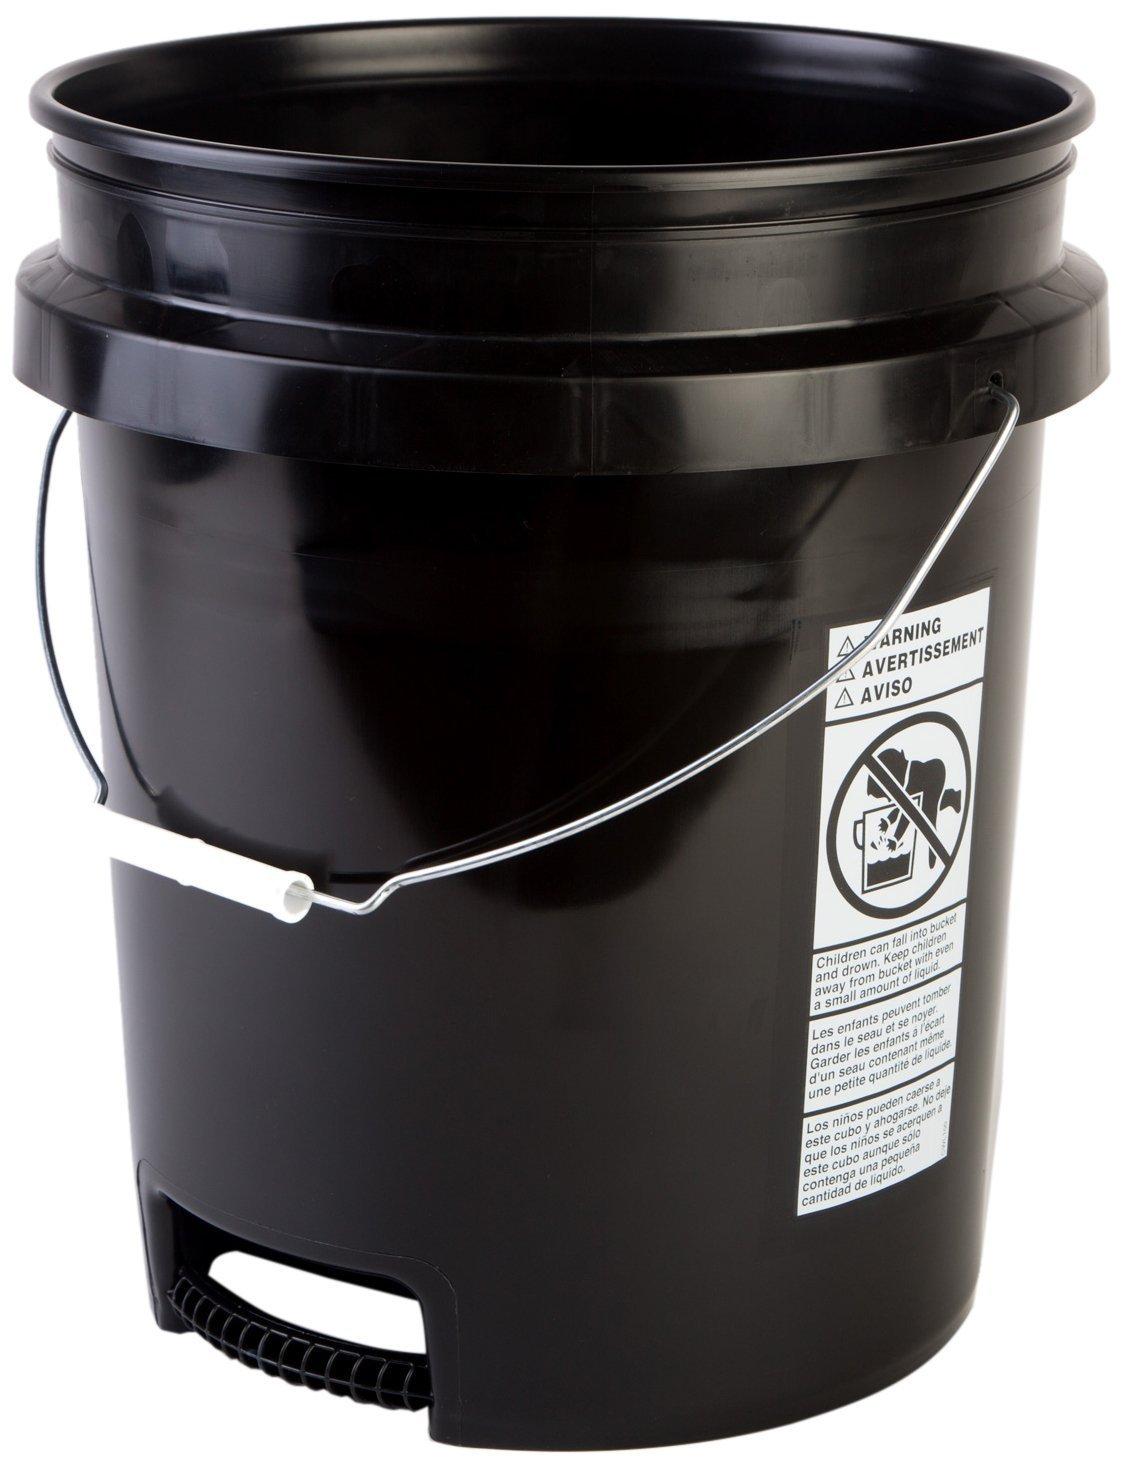 Hudson Exchange 5 Gallon Bucket with Bottom Grip Handle, HDPE, Black, 4 Pack